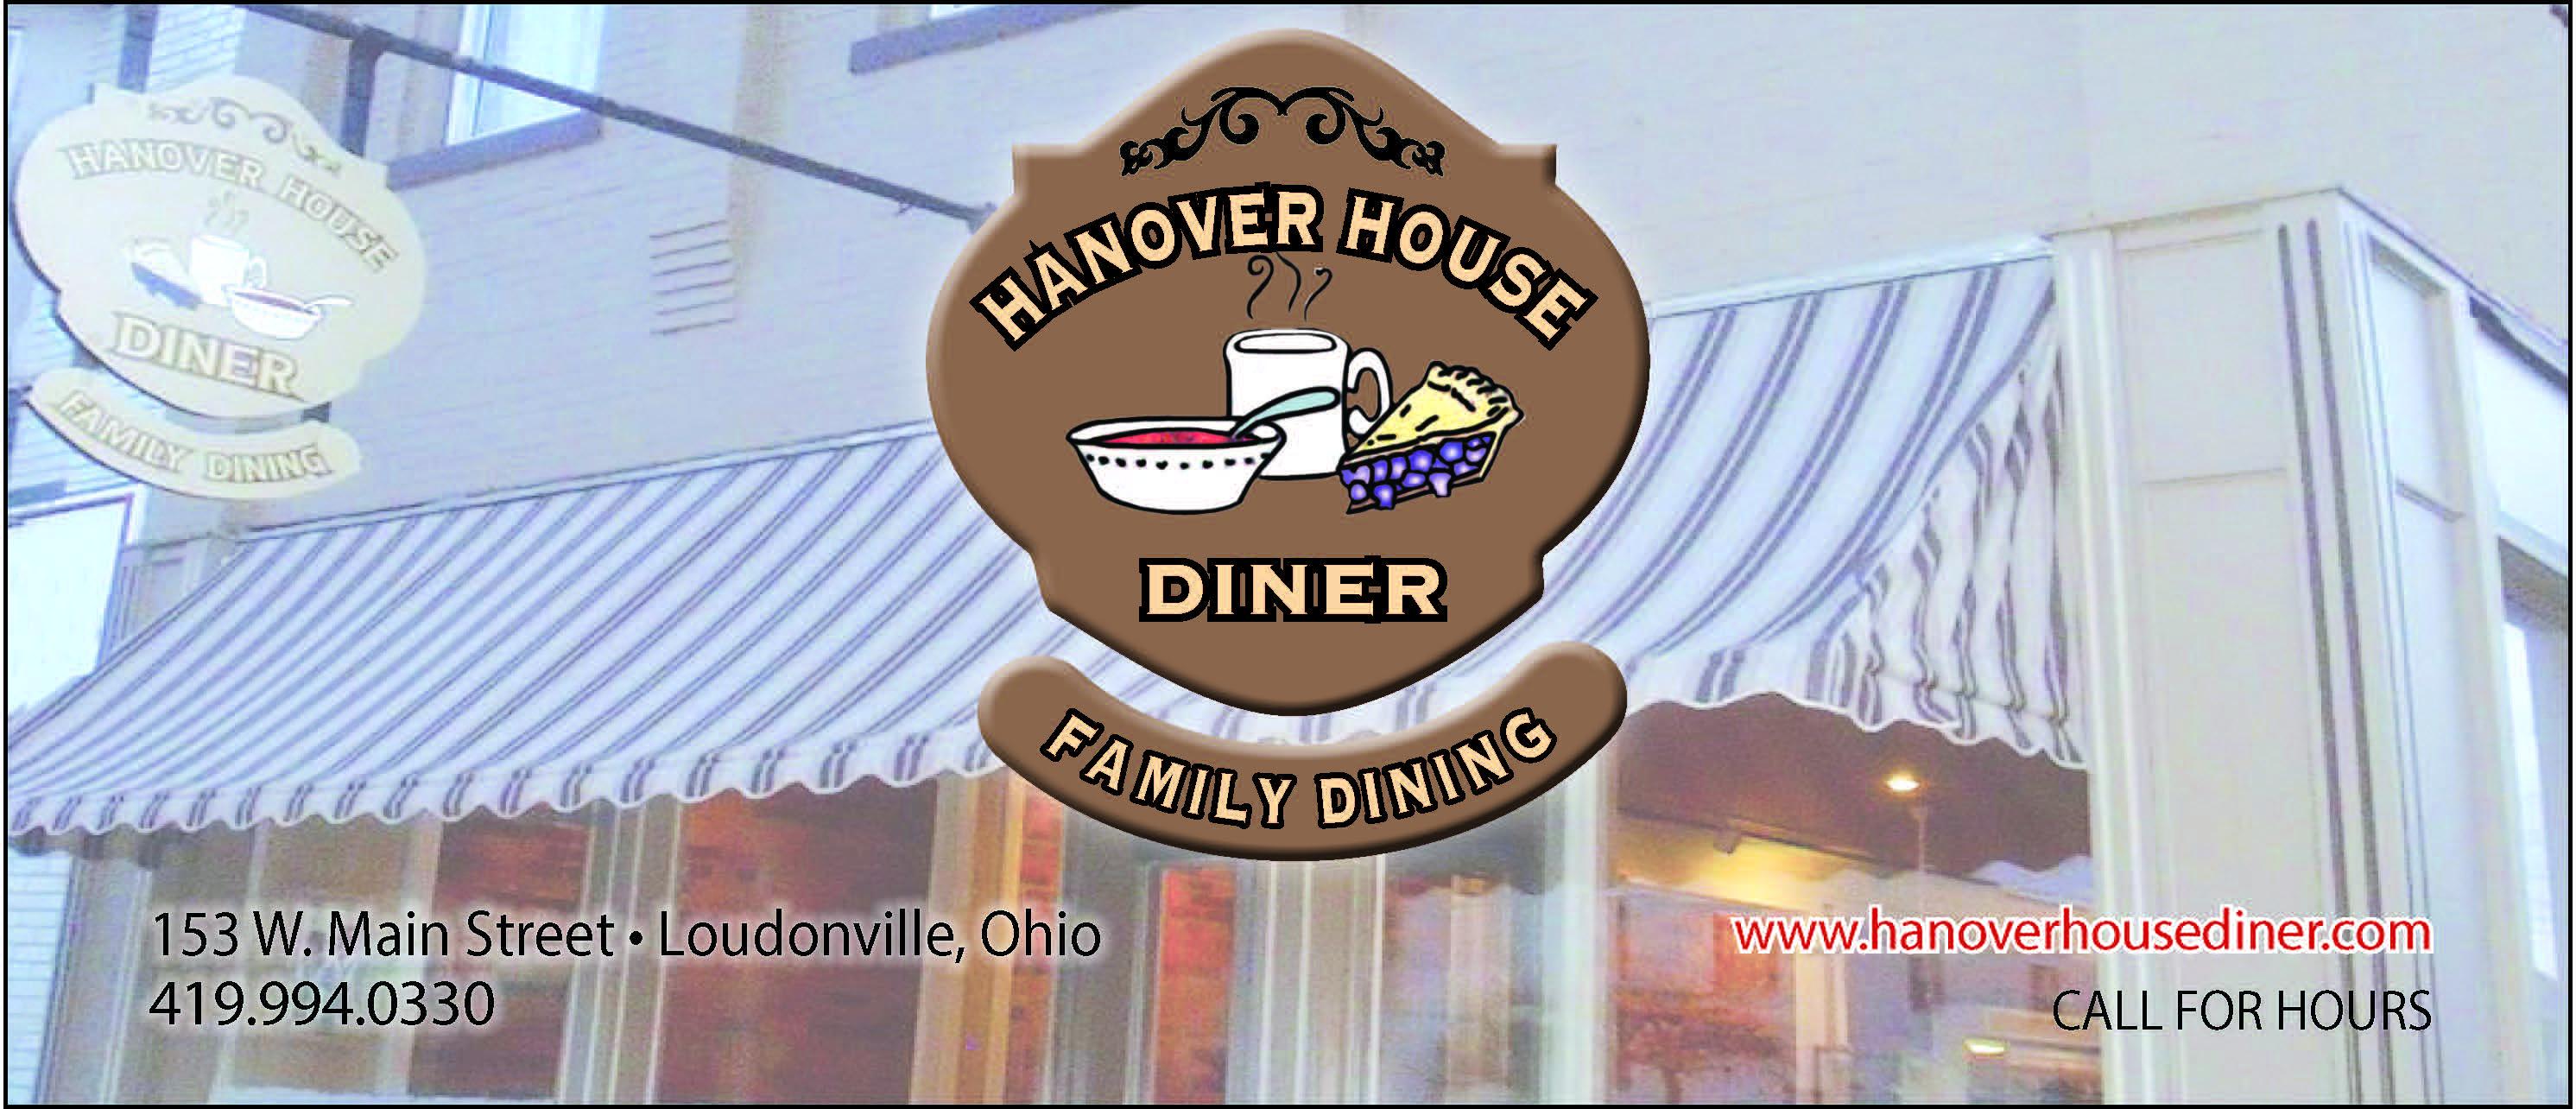 HanoverHouse